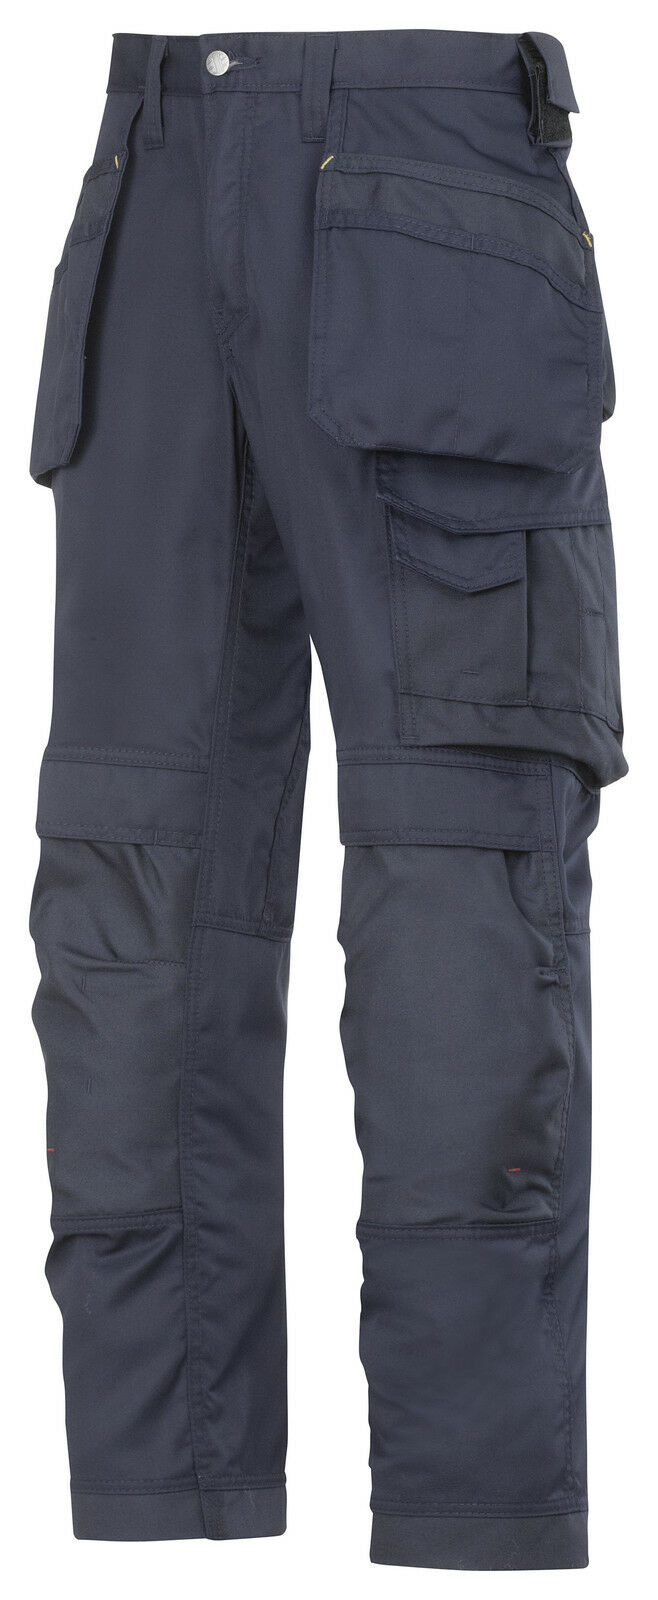 Snickers 3211 cooltwill Pantalones Pantalones Pantalones Snickers Directa azul marino 940487